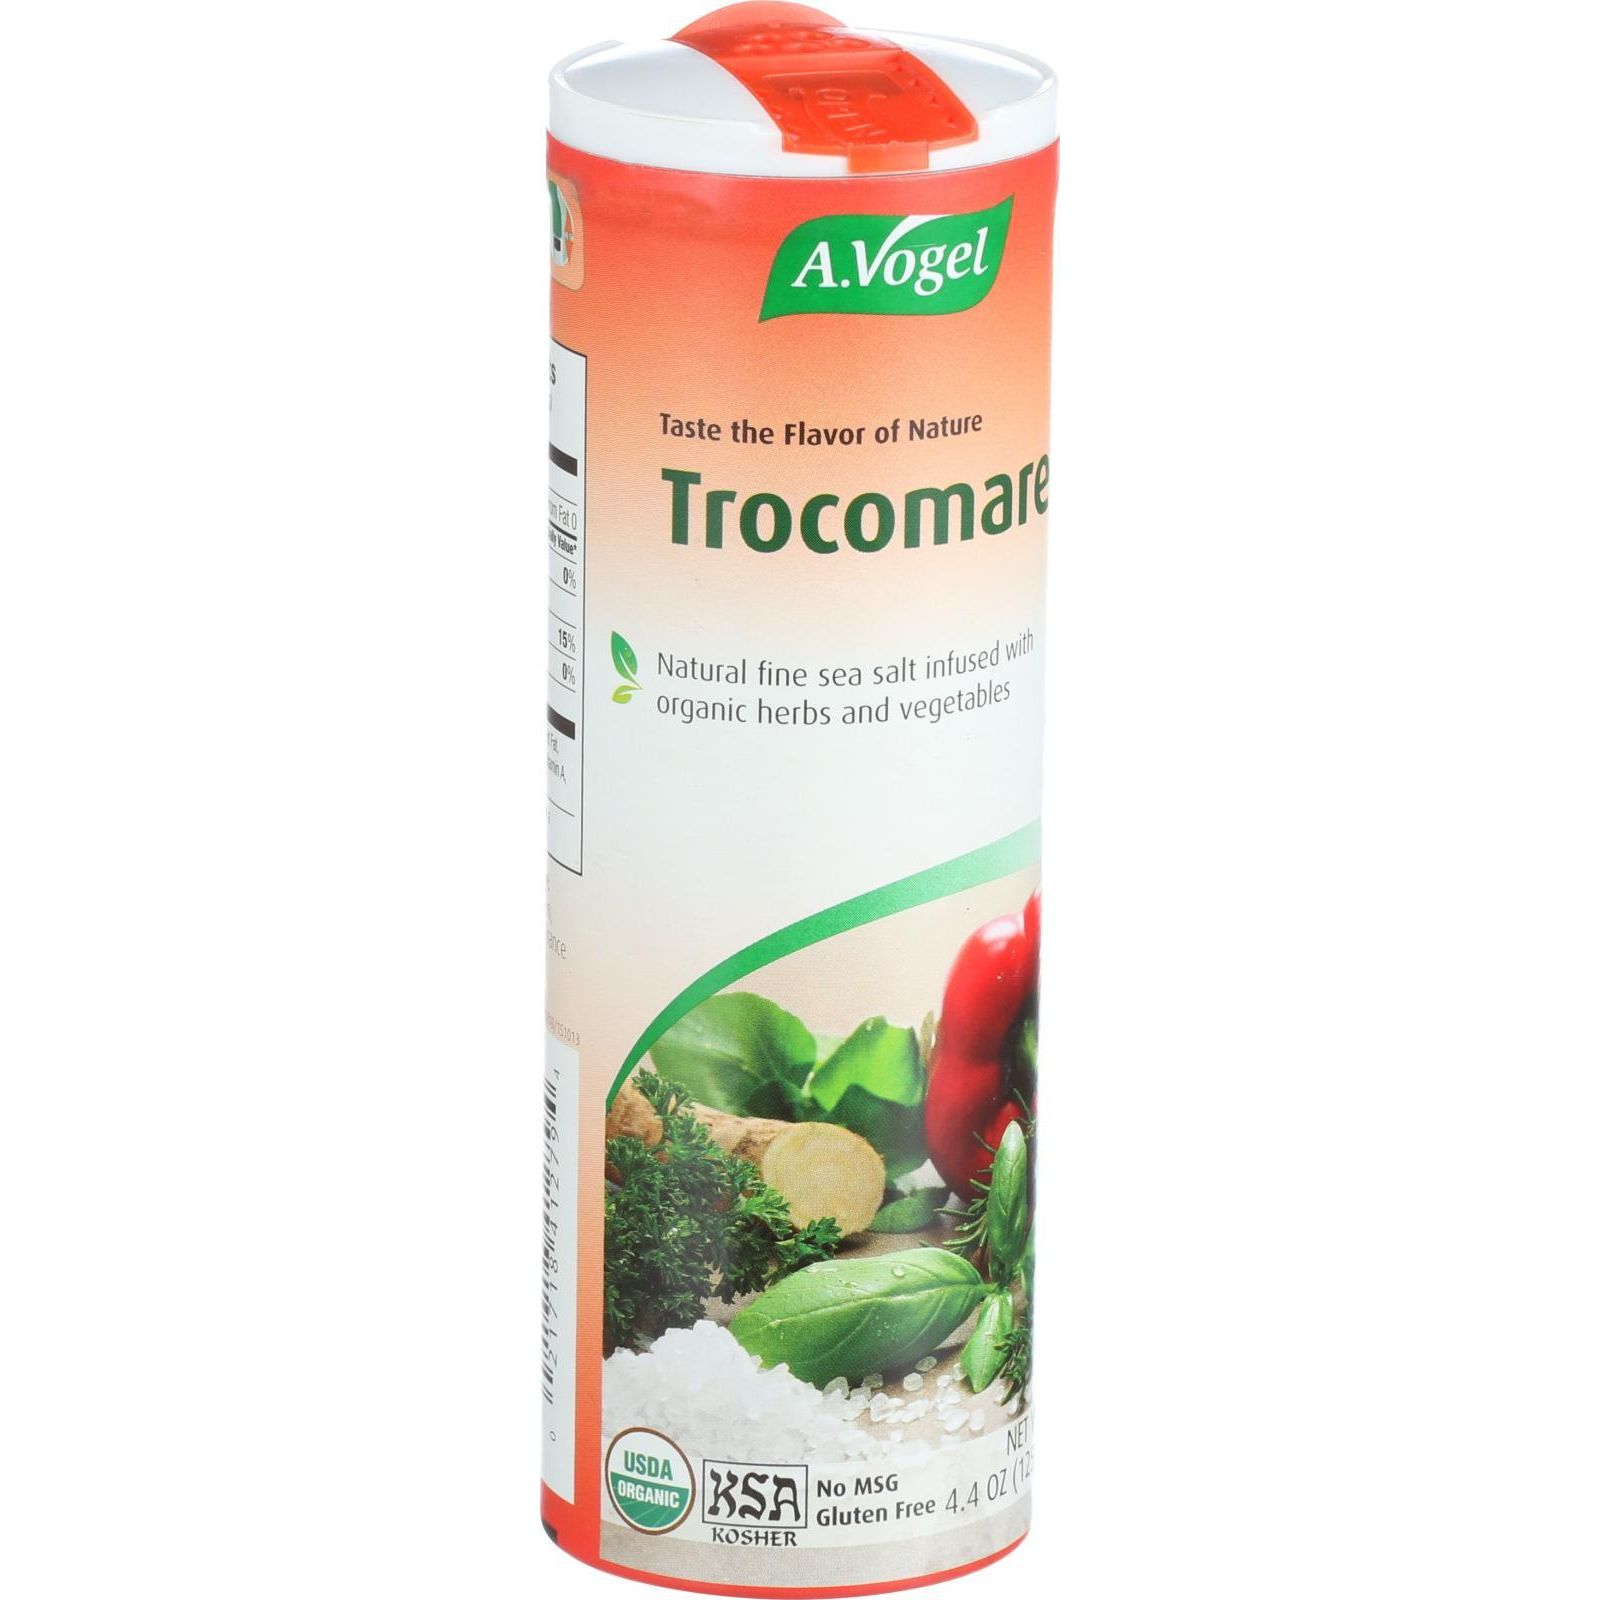 A Vogel Organic Trocomare Seasoning - Spicy - 4.4 oz